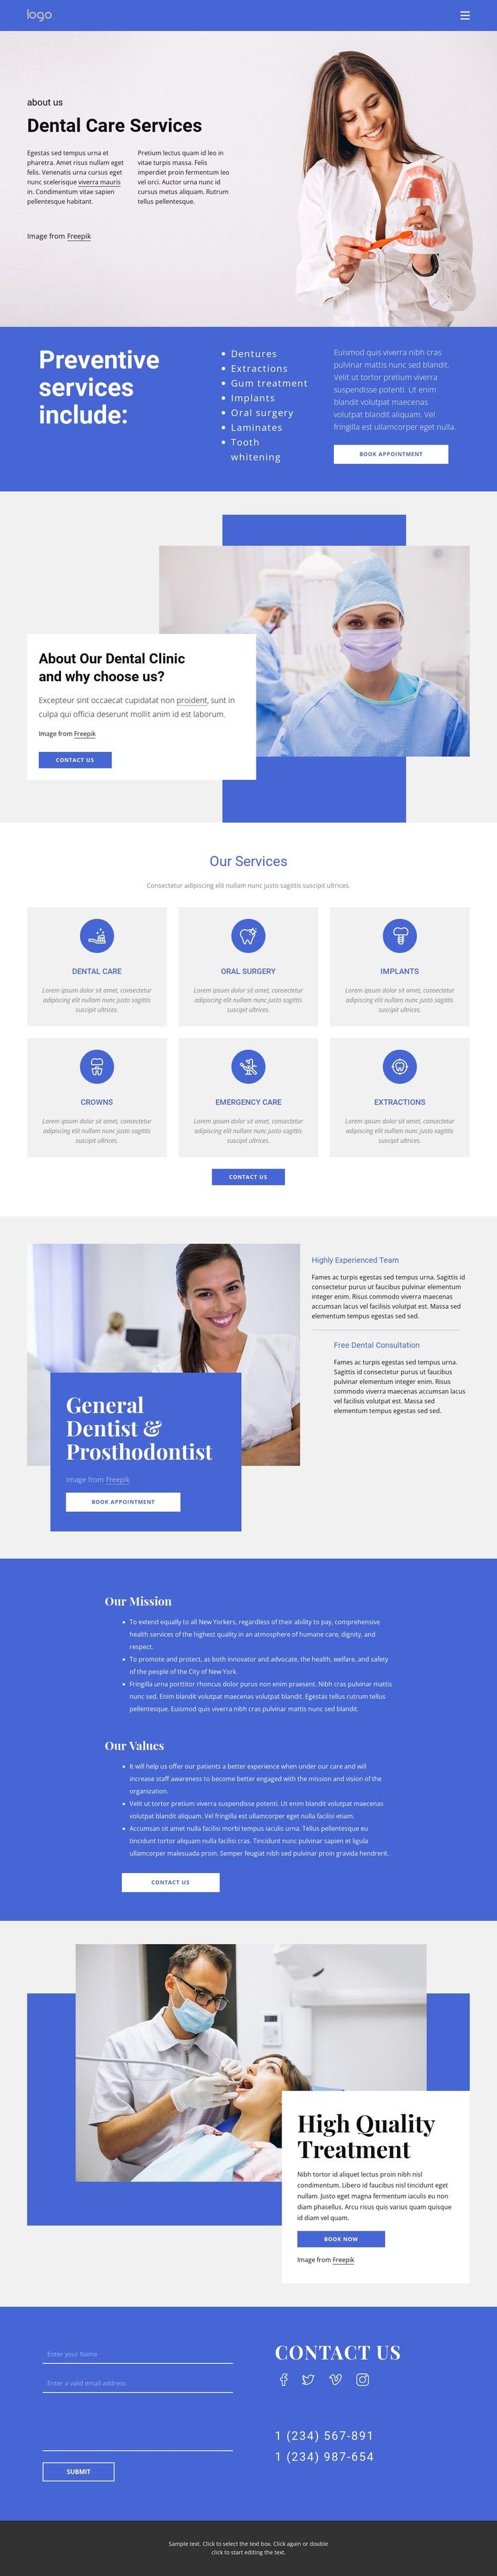 Dentist and prosthodontics Static Site Generator